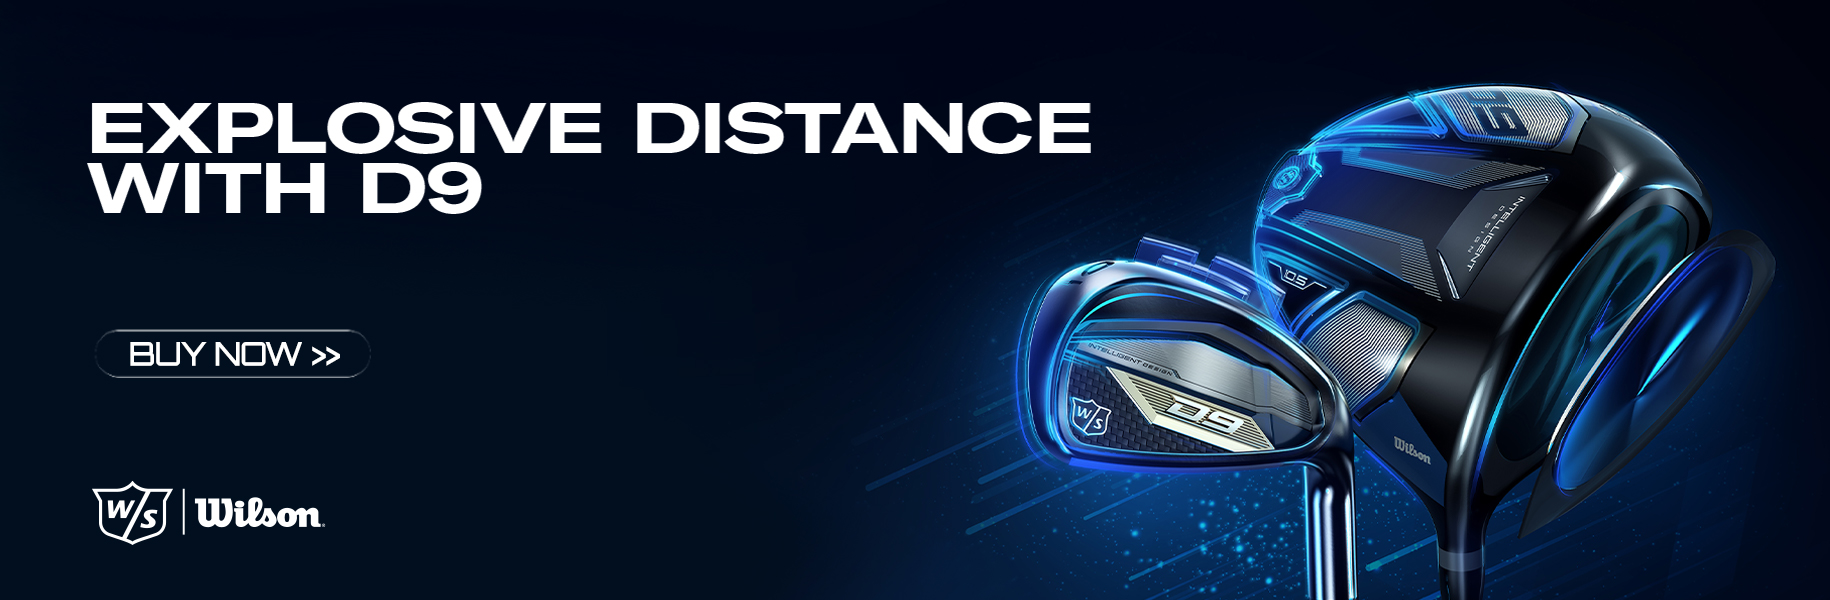 New Wilson D9 Range - Buy now.